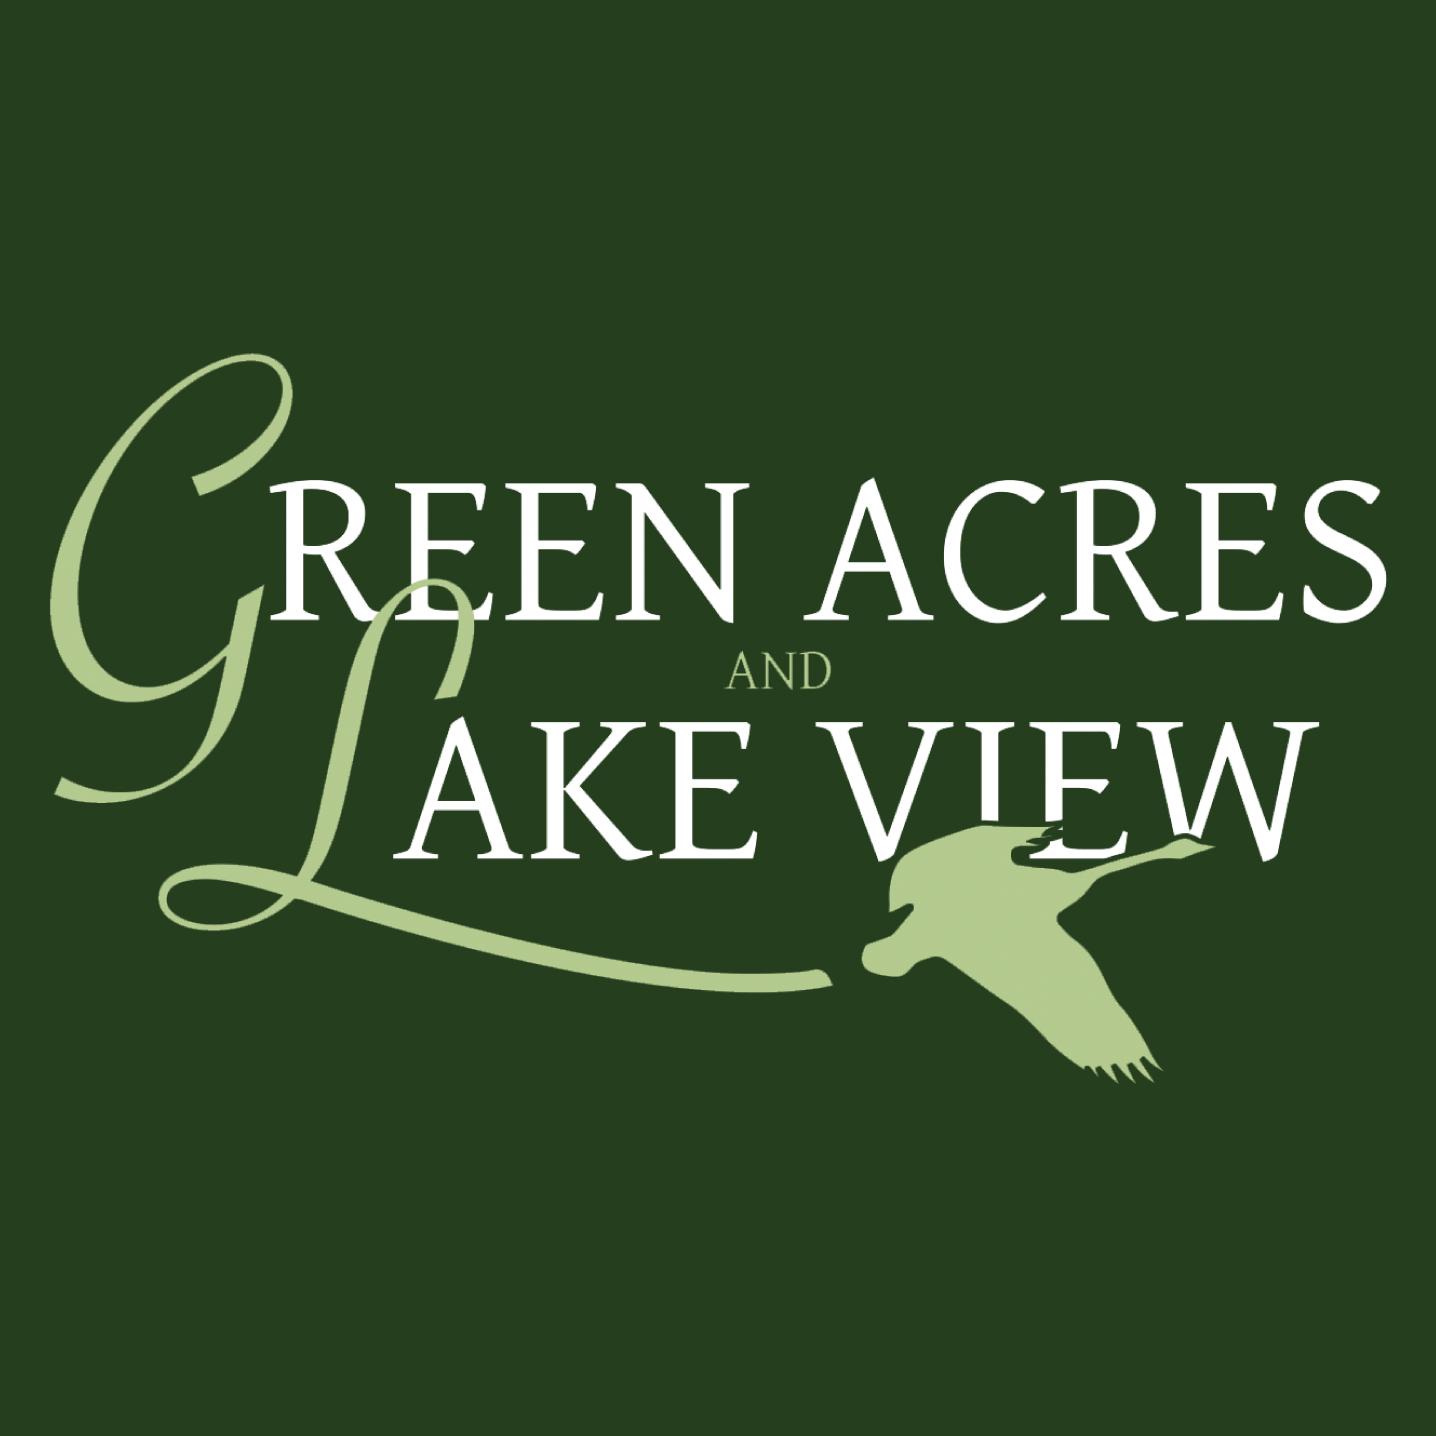 Green Acres & Lake View